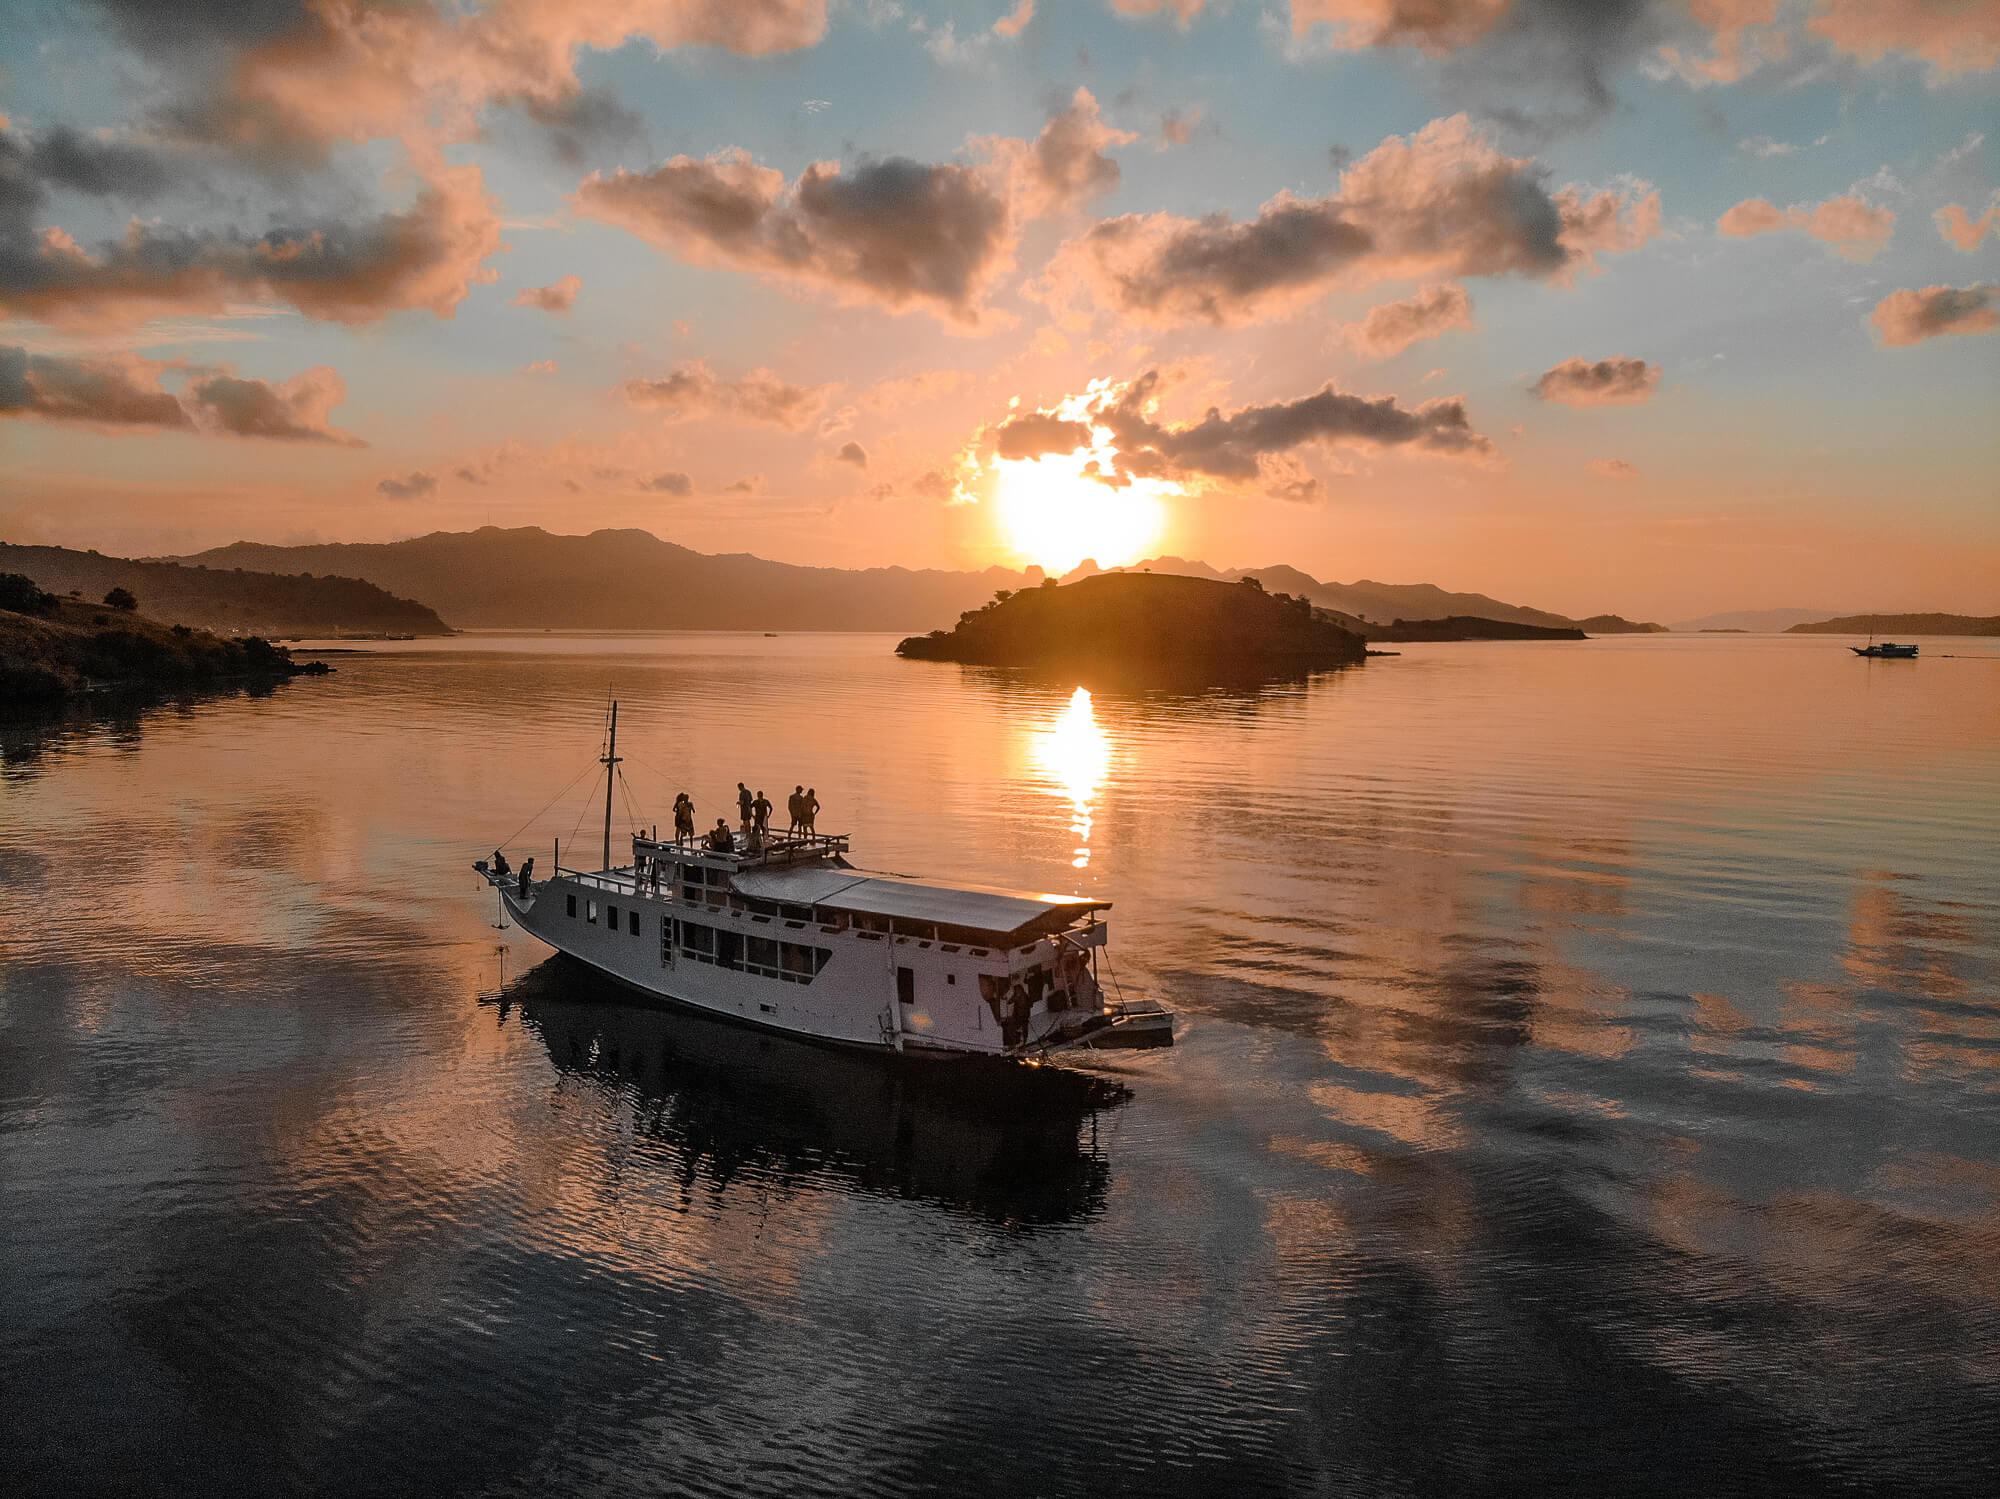 Wanua adventure, boottocht lombok Flores, reizen door flores, budget Flores, budget indonesië, kostprijs Indonesië, hoeveel kost reizen door Indonesië, belgisch reisblog, youngwildfree